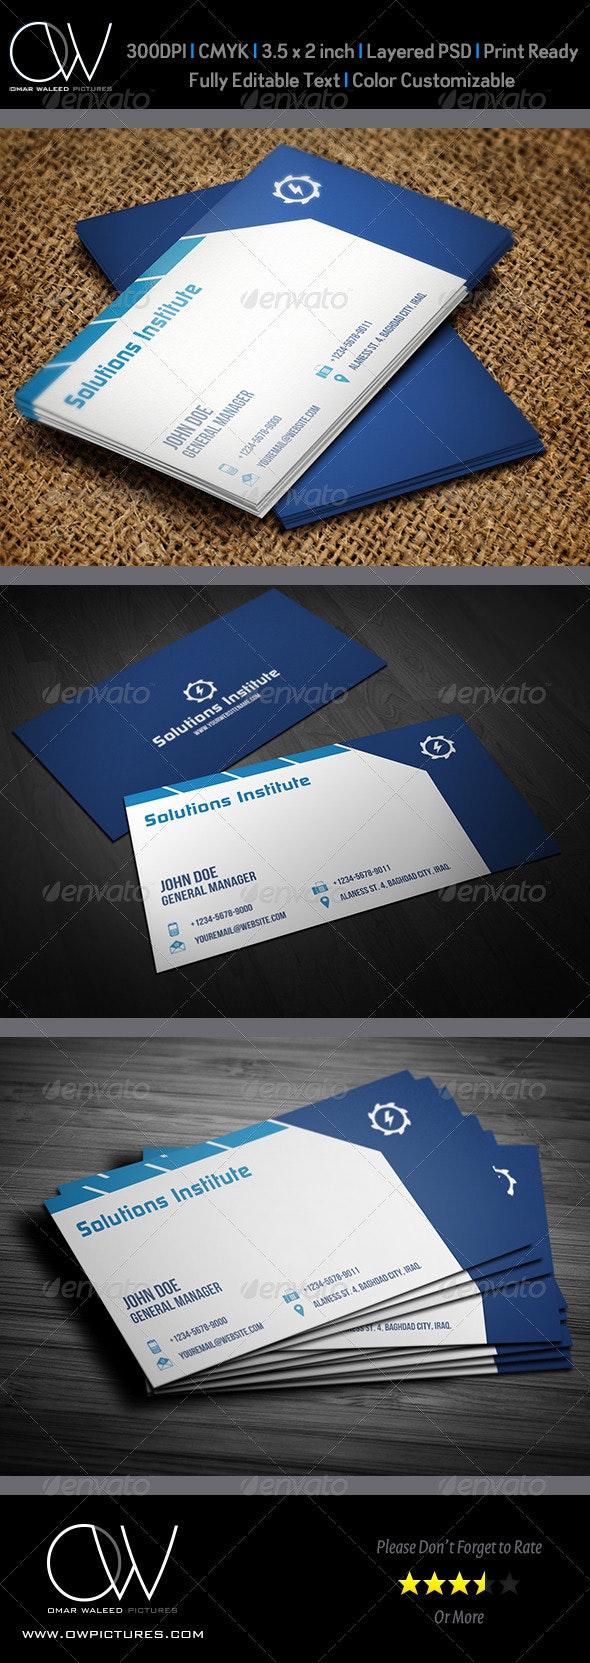 Corporate Business Card Template Vol.35 - Corporate Business Cards